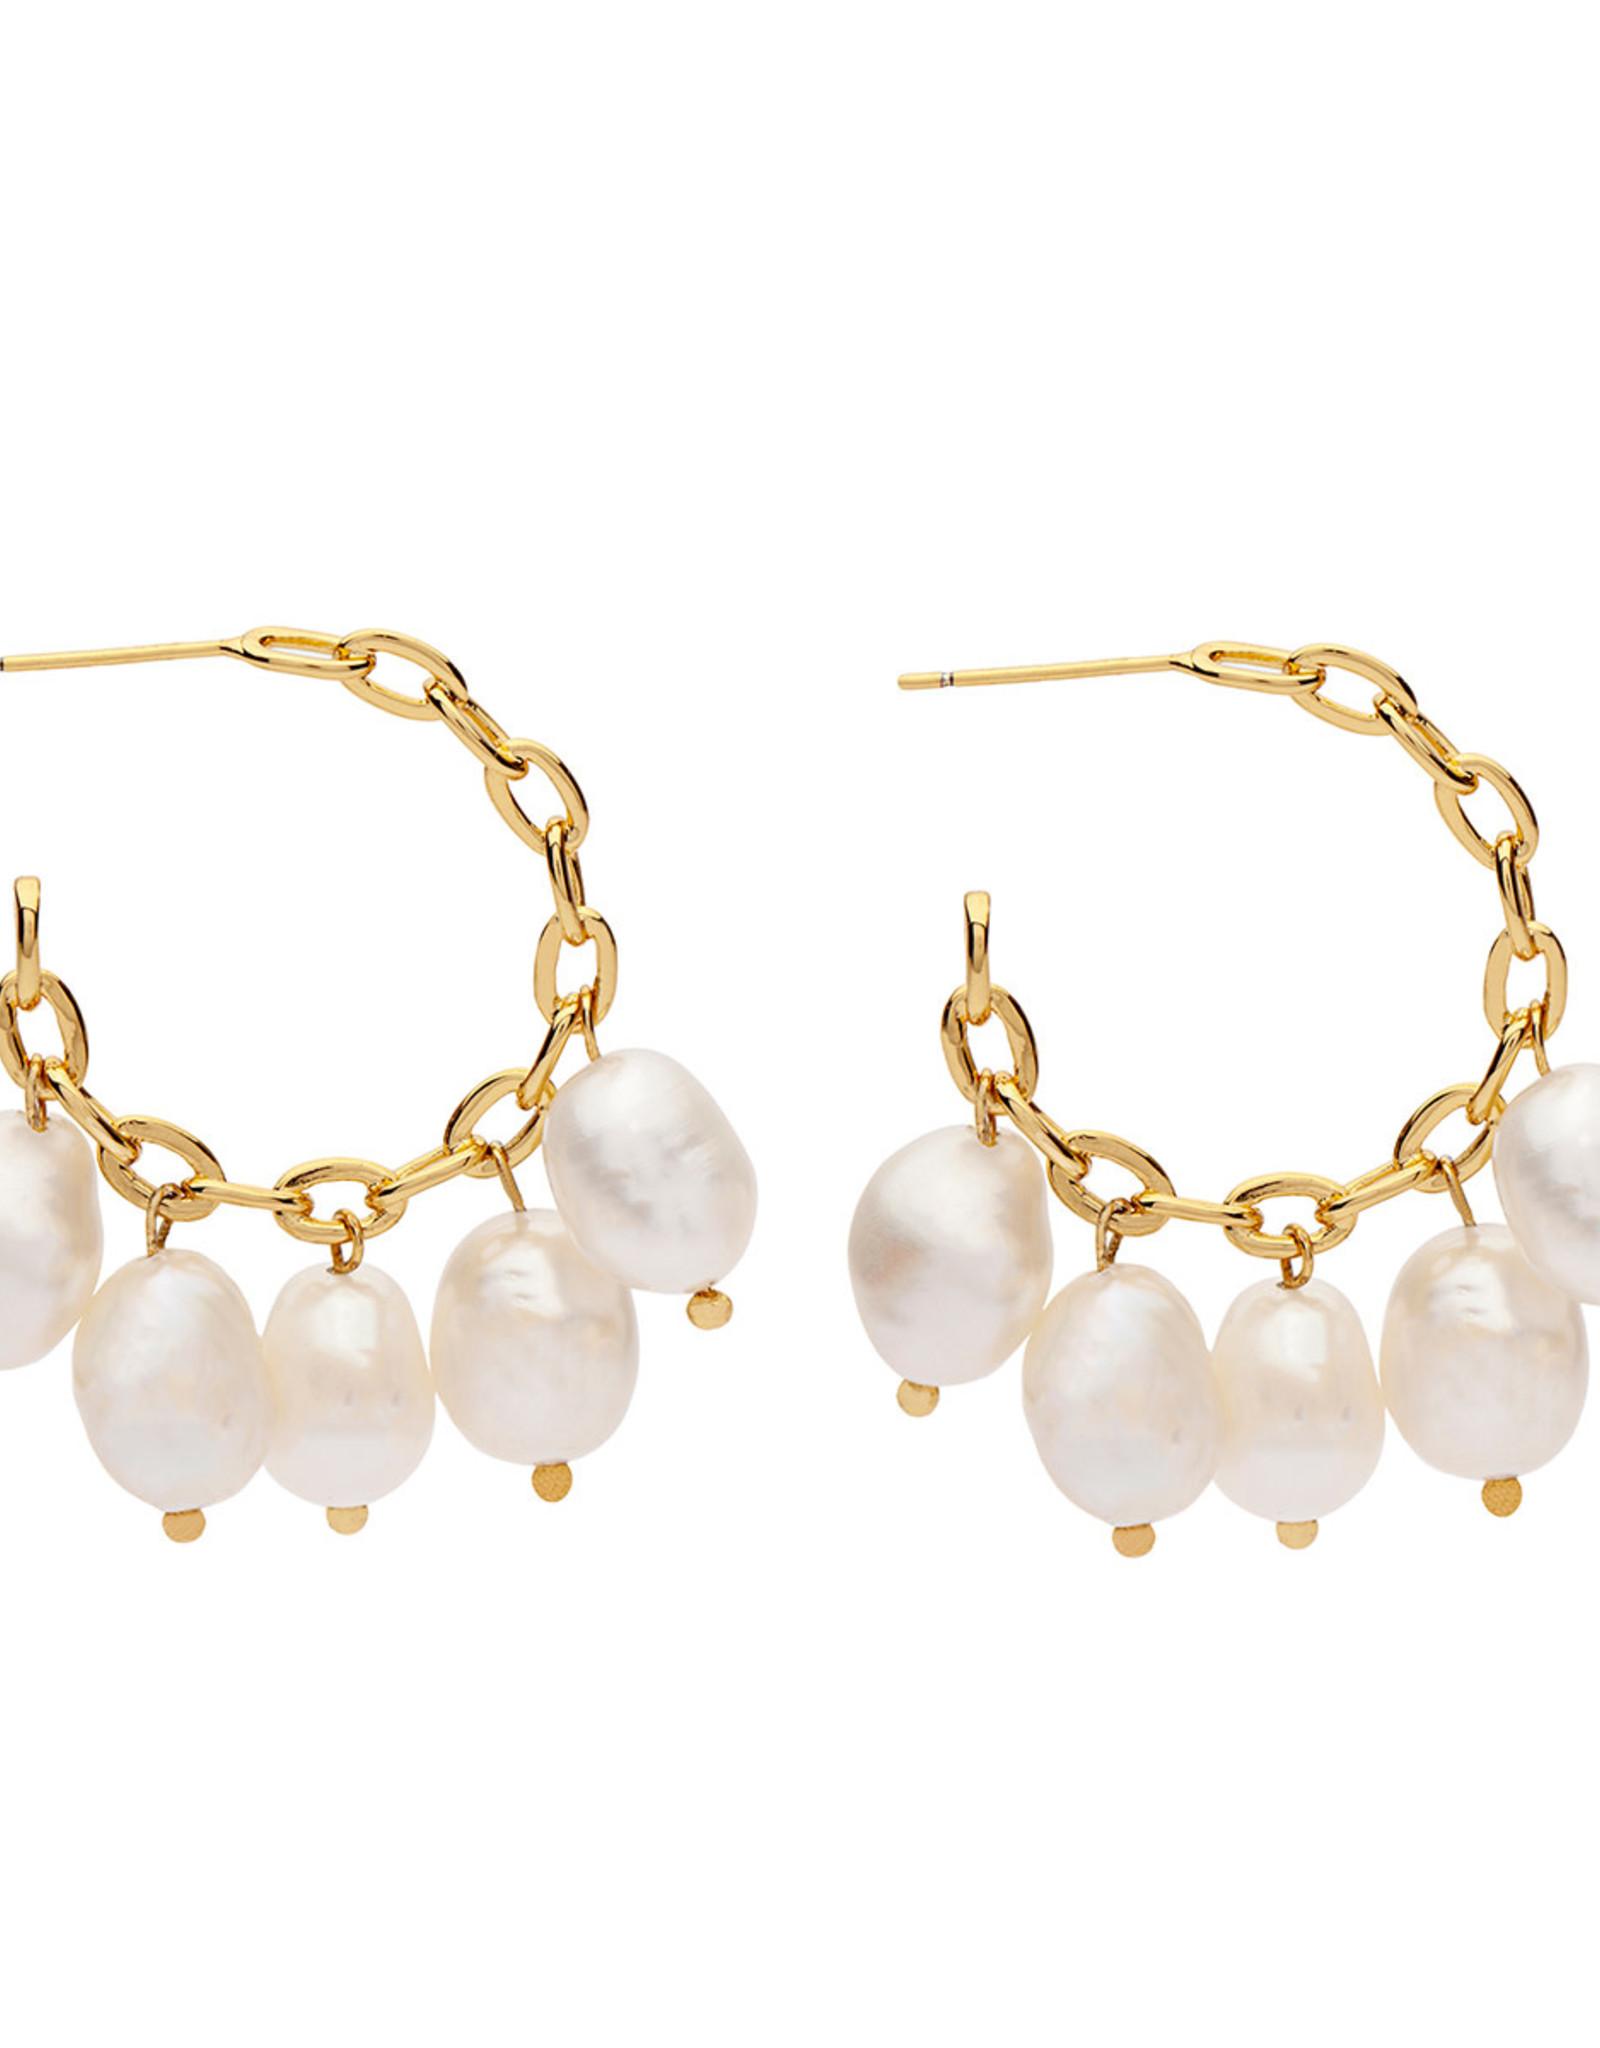 Amber Sceats Caela Earrings